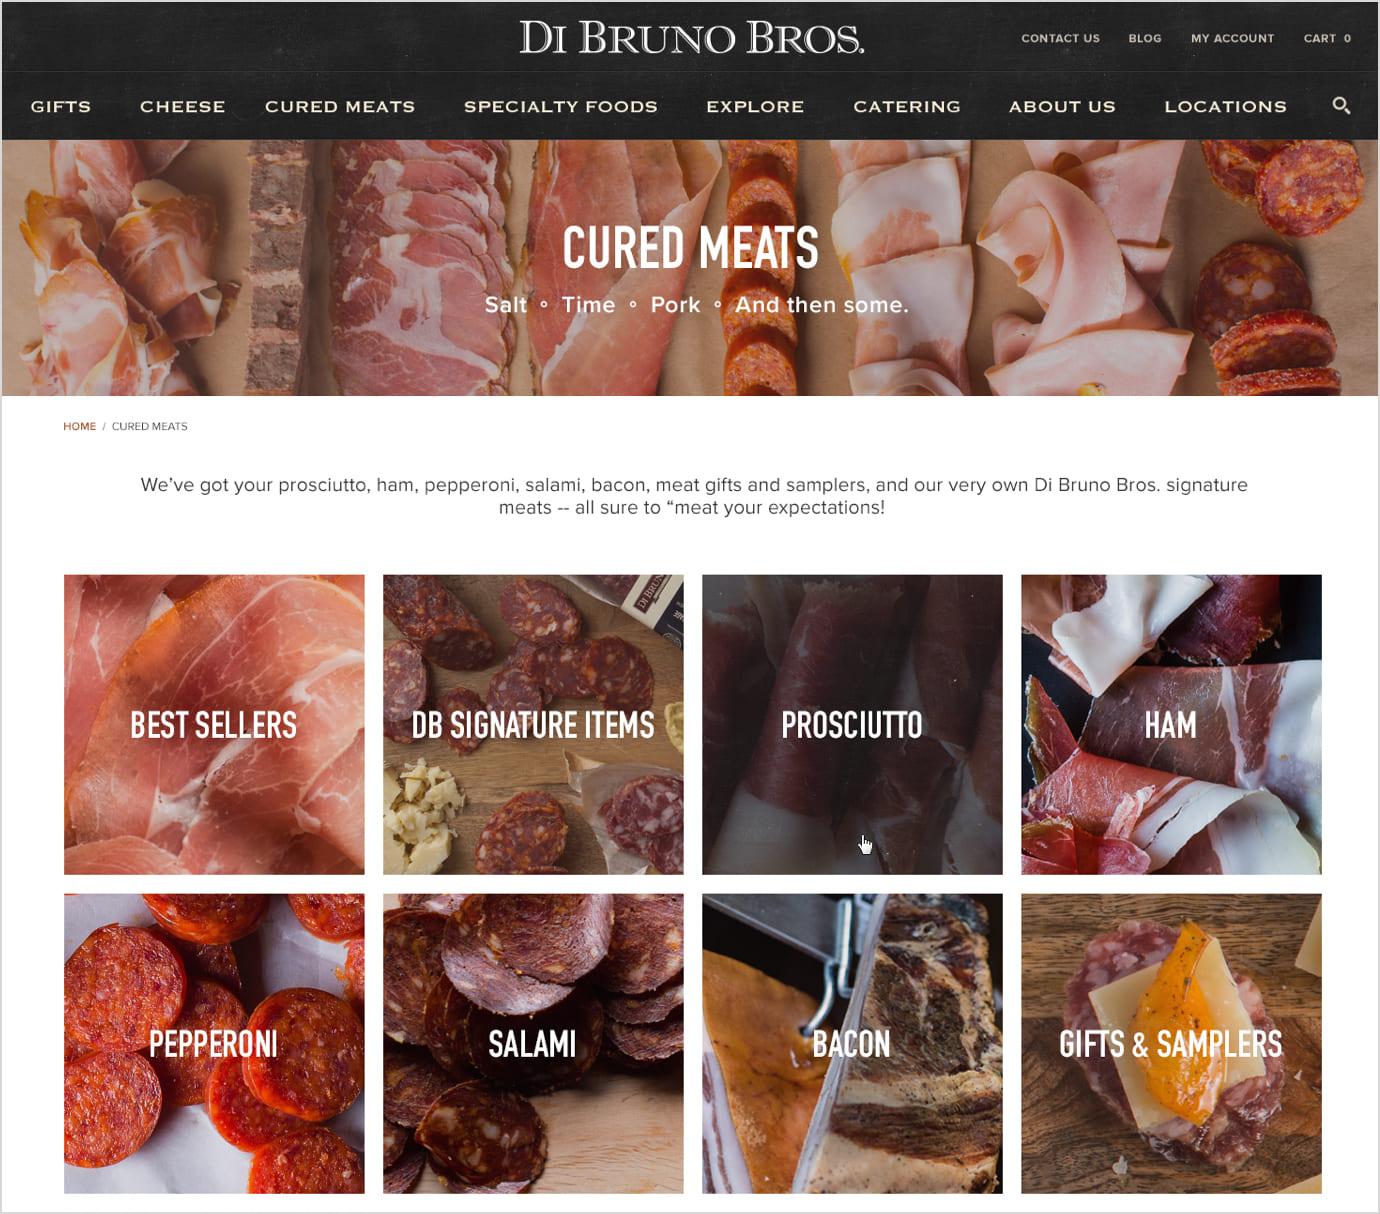 DiBruno Bros Category Page